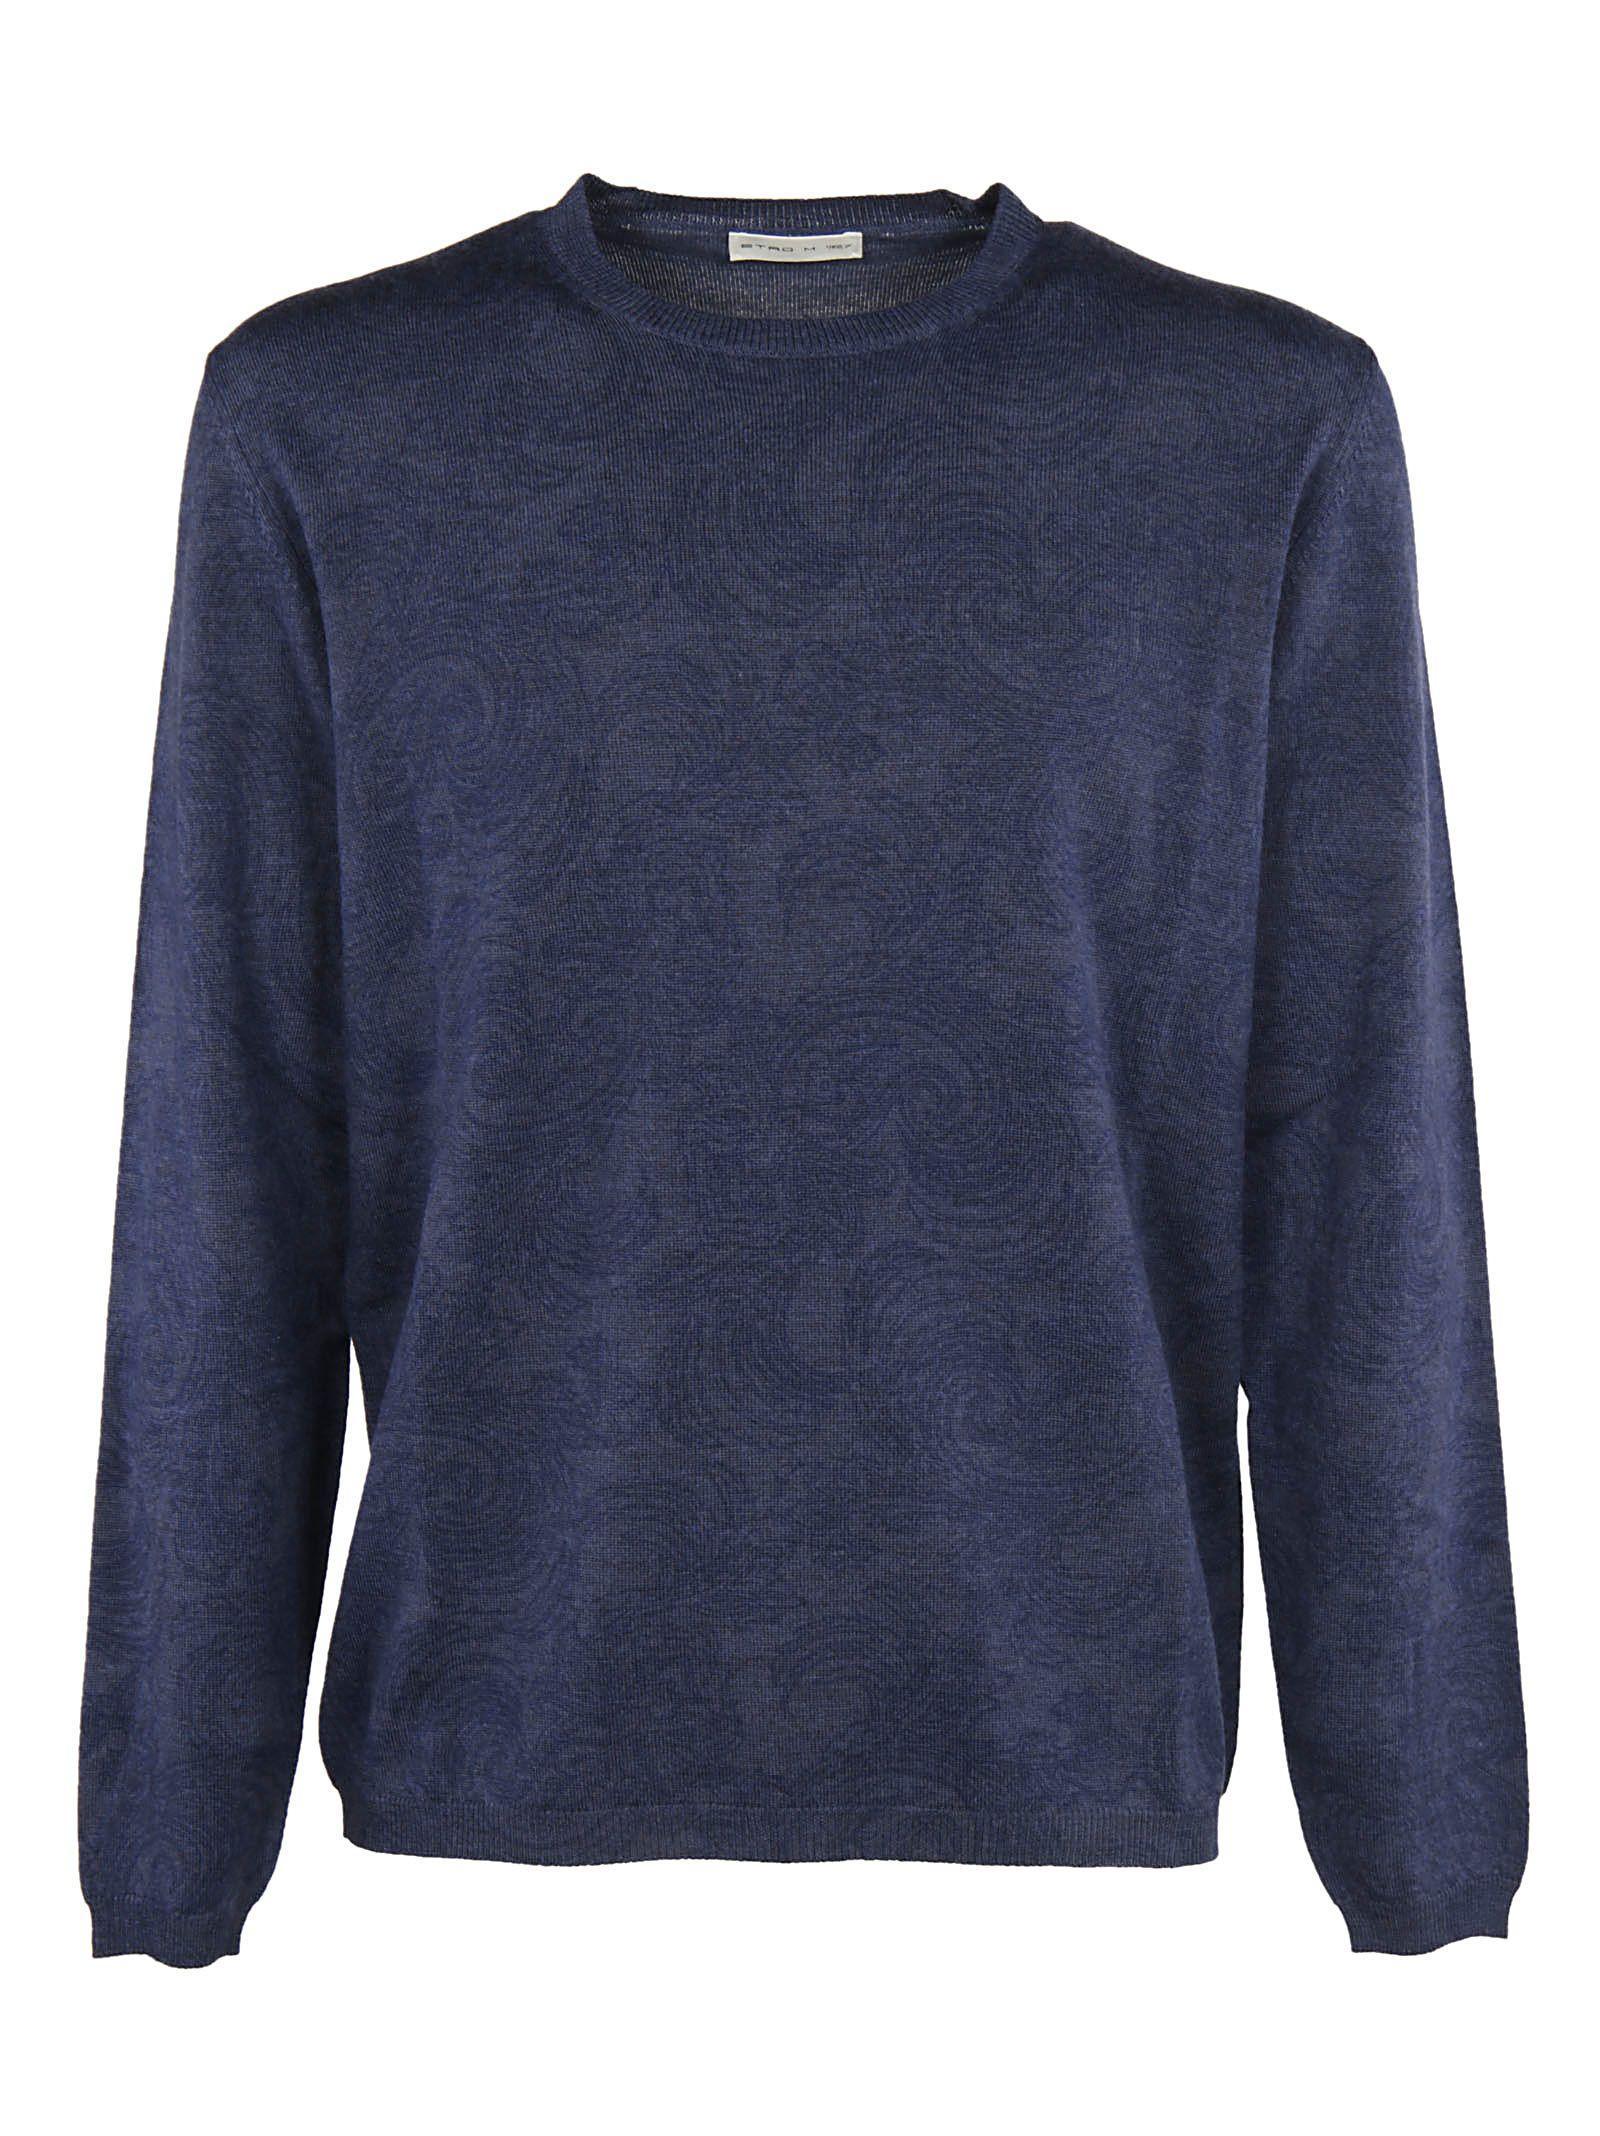 Etro Floral Embroidery Sweatshirt